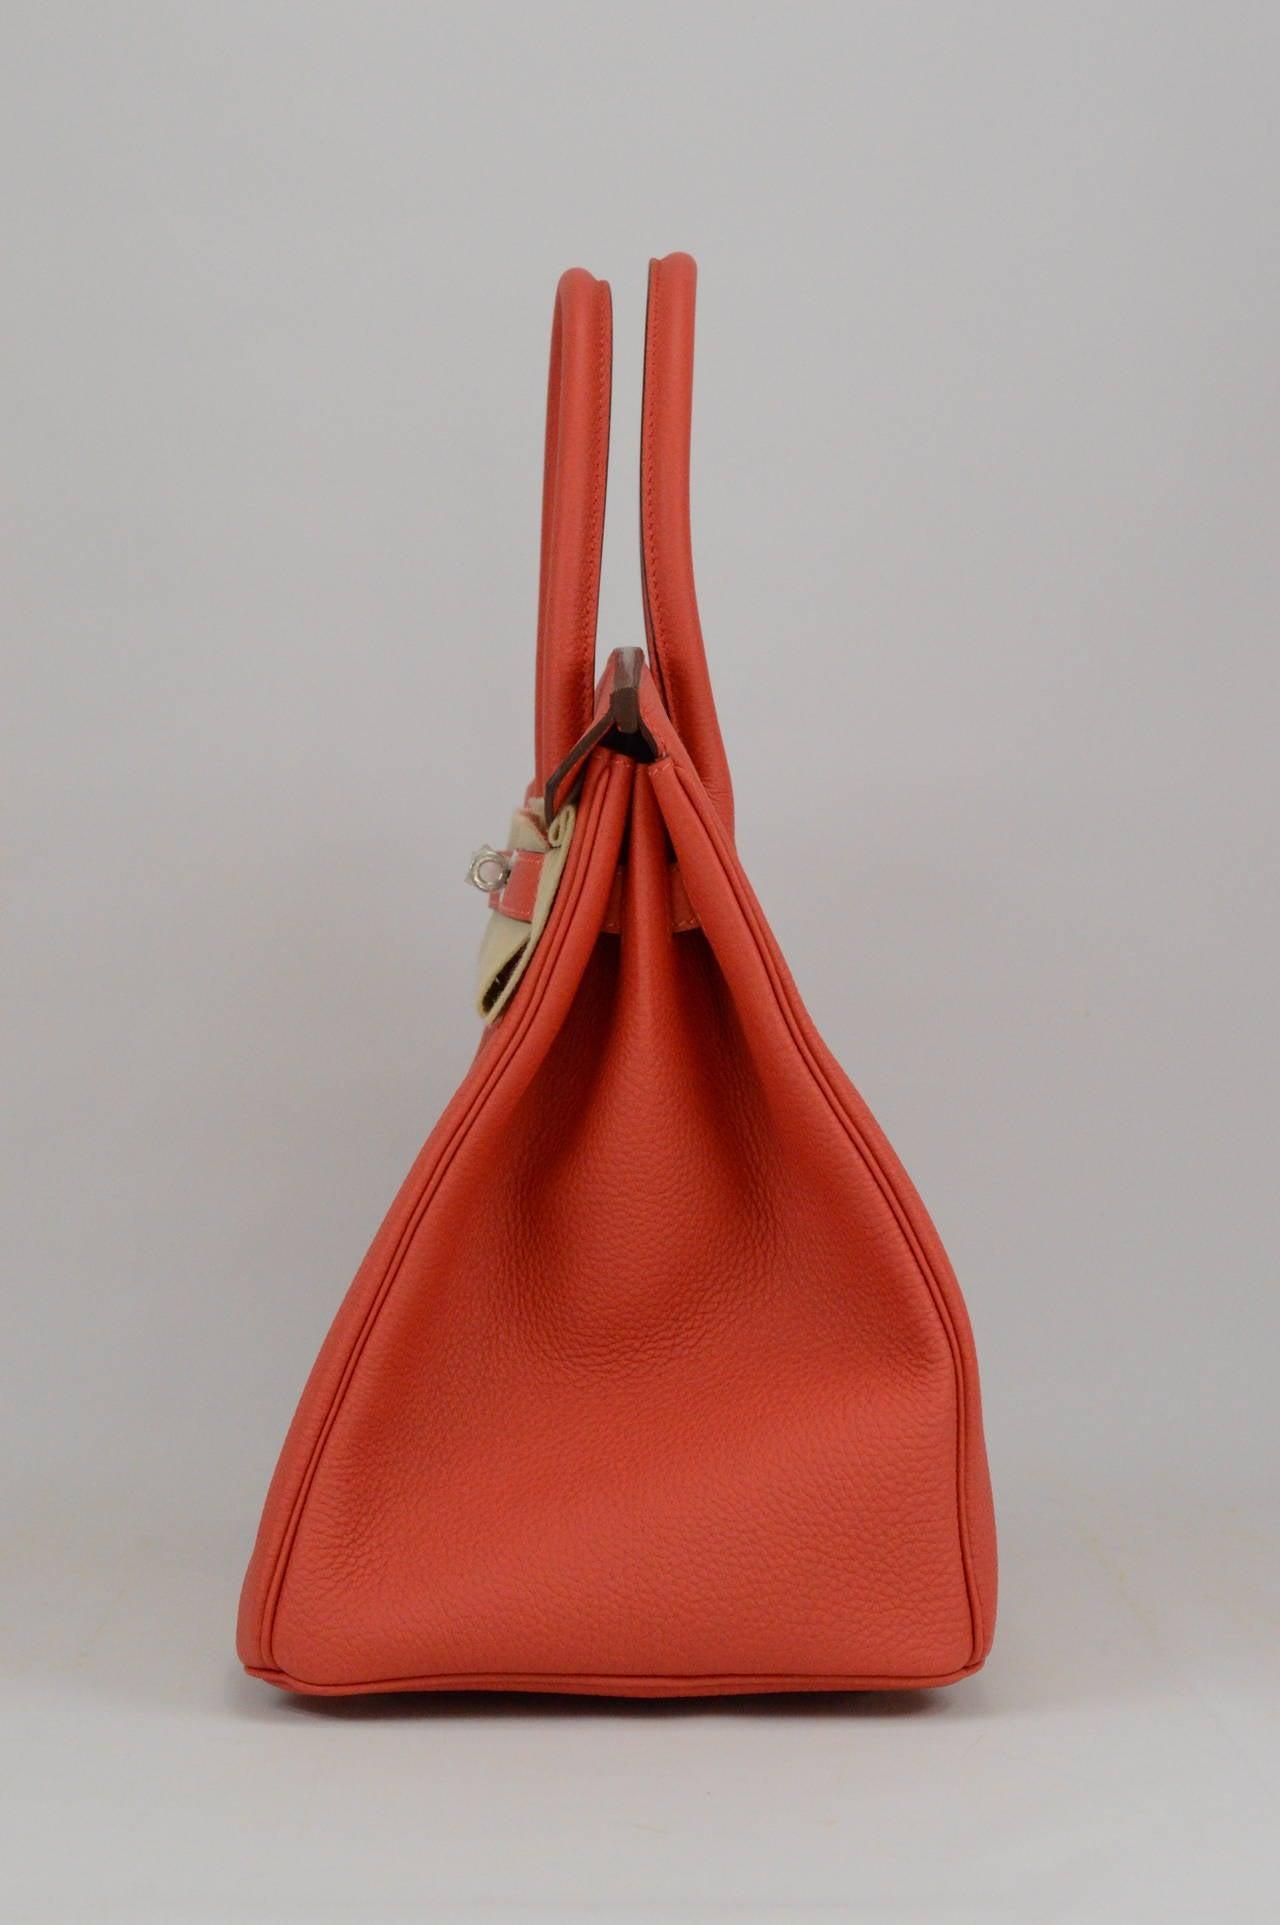 where to buy hermes - 2014 Hermes Birkin Bag 35 Rouge Pivoine Togo Leather Palladium ...